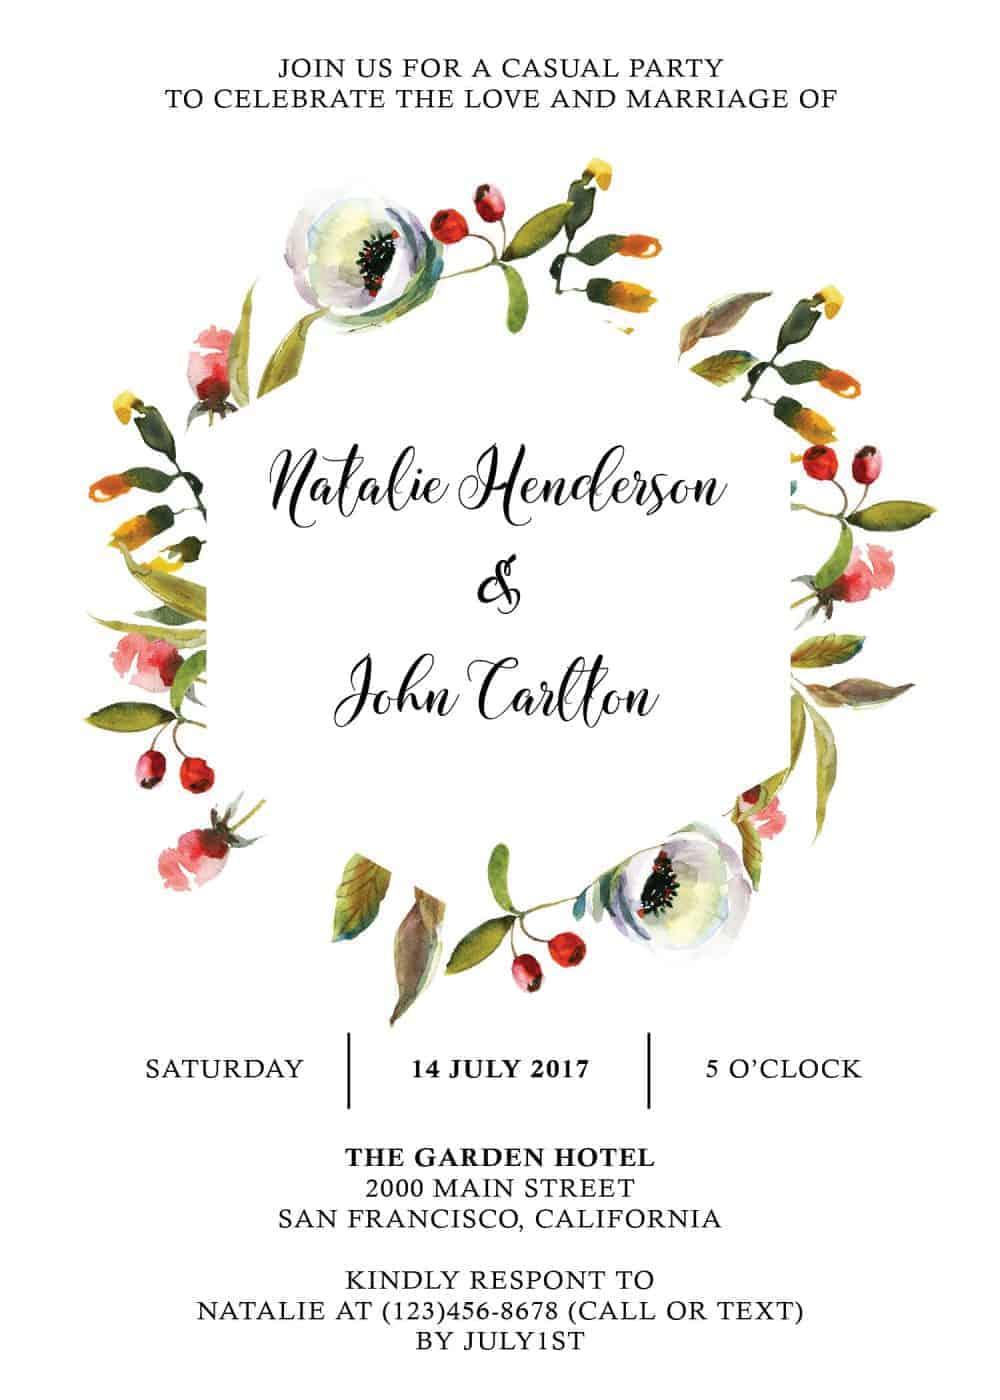 Floral Garland , Simple Elopement Invitation Cards, Light Wedding Elopement Card, Marriage Announcement Cards elopement245